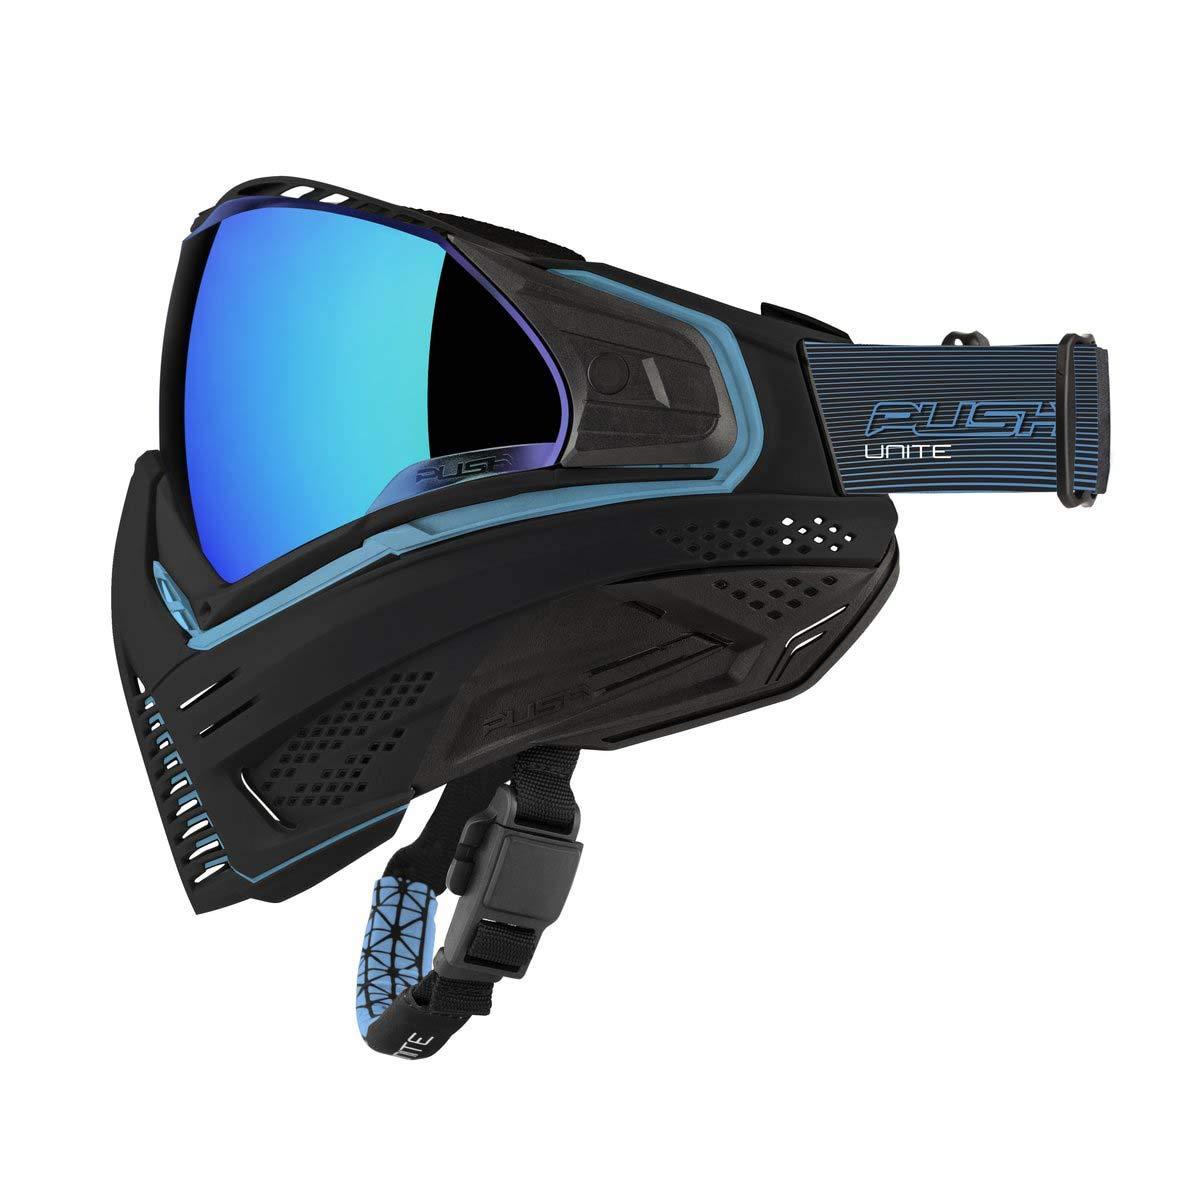 Push Unite Paintball Goggles /& Case